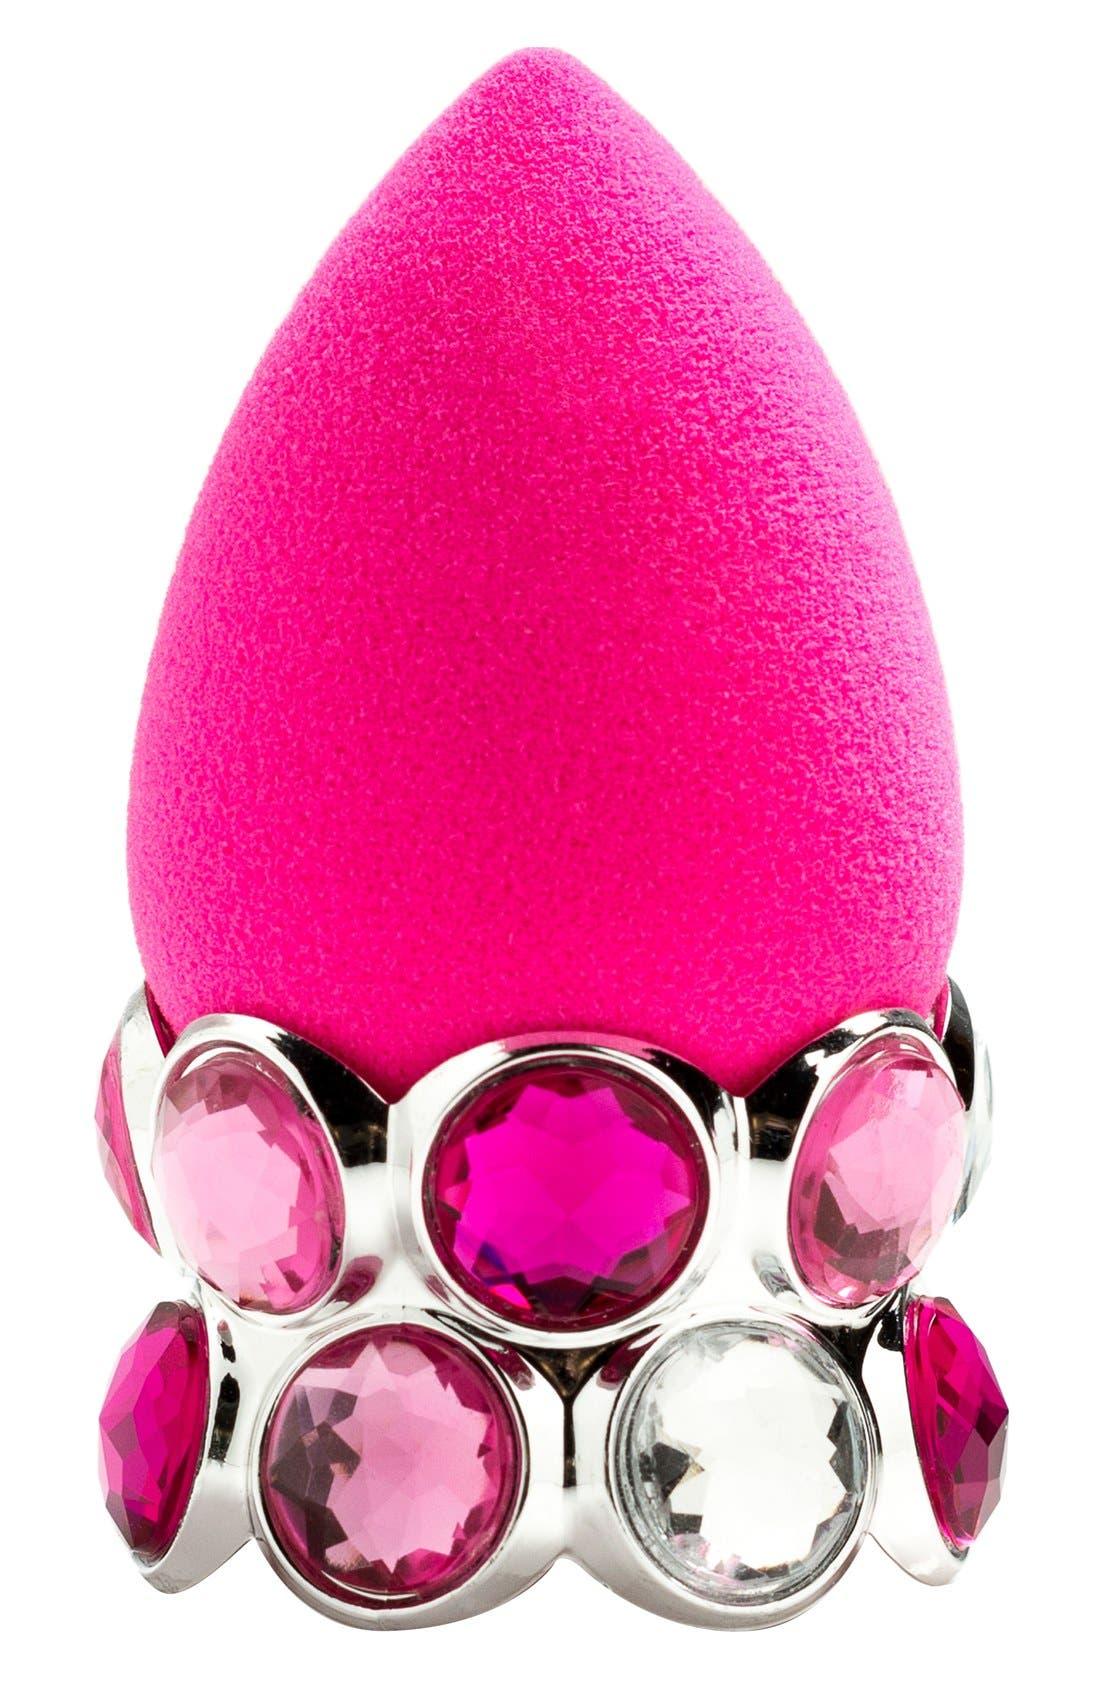 BEAUTYBLENDER<SUP>®</SUP>,                             'bling.ring' Original Makeup Sponge Applicator Kit,                             Main thumbnail 1, color,                             000